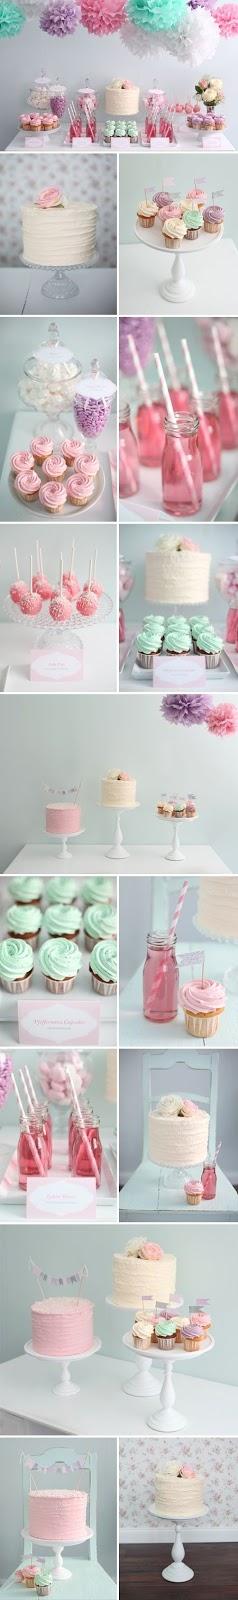 ideas_decoracion_comuniones_bautizos_cumpleaños_babyshower_candy_bar_lolalolailo_19